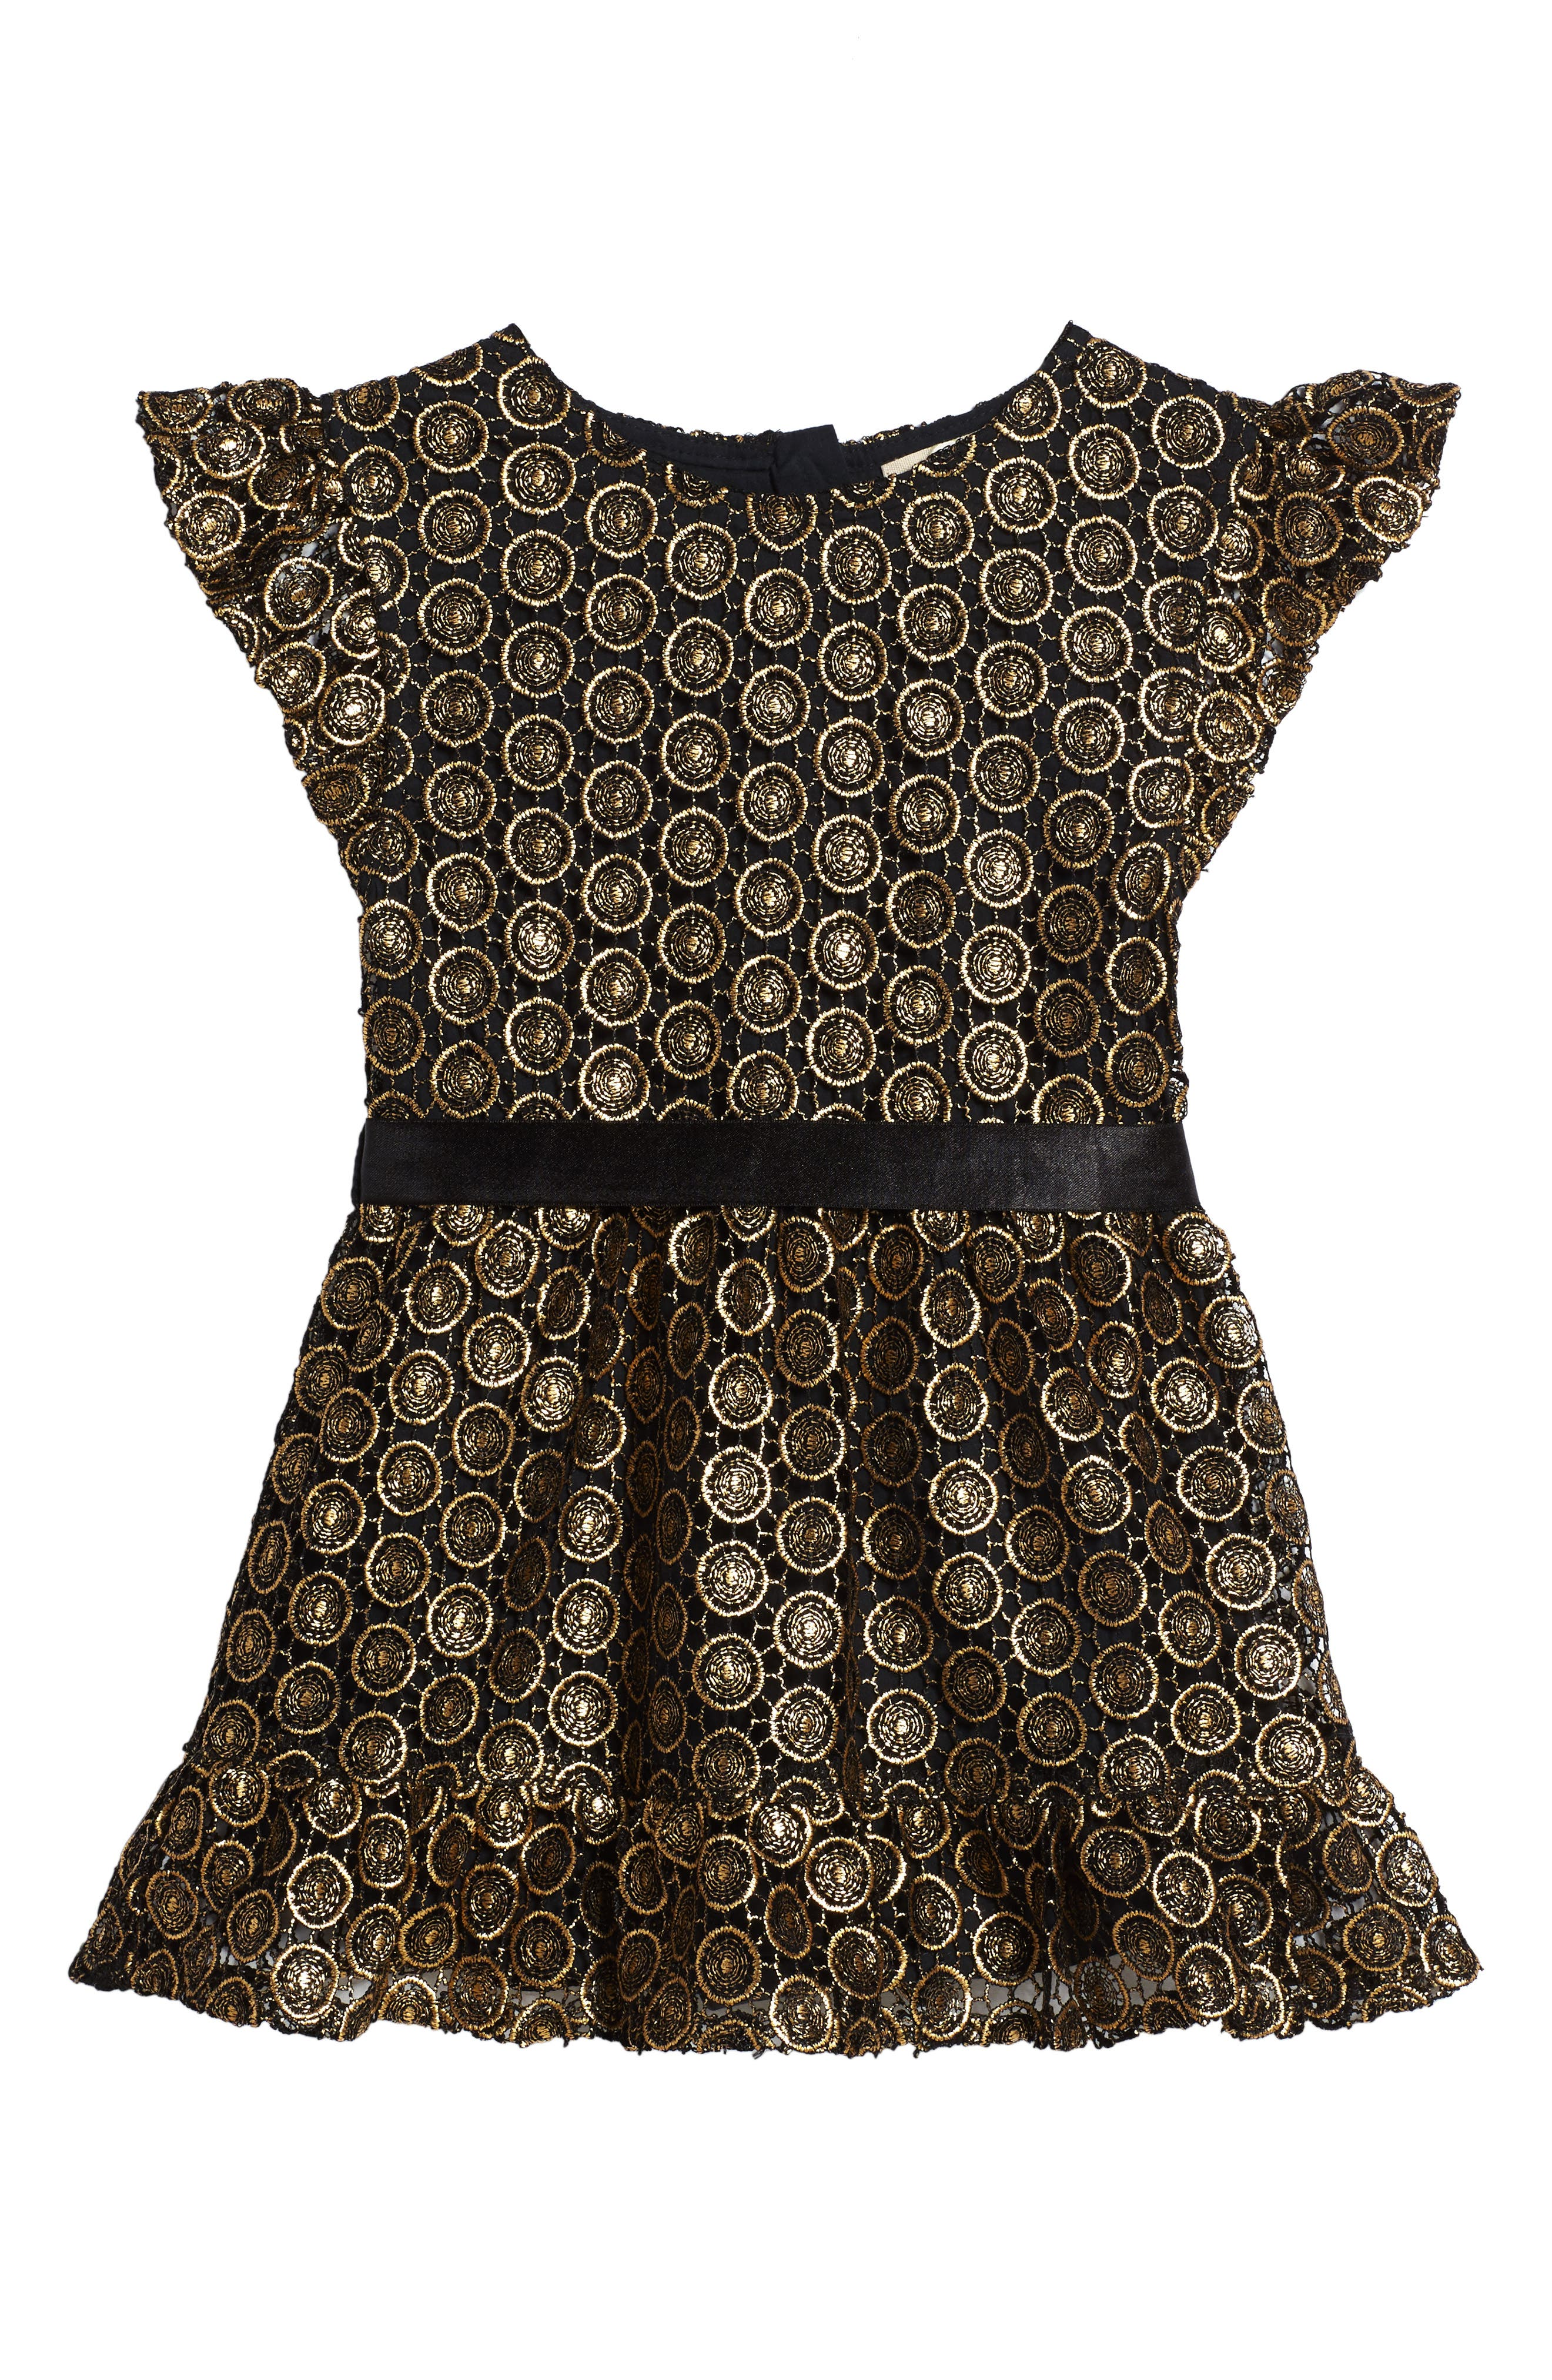 Metallic Lace Dress,                             Main thumbnail 1, color,                             010